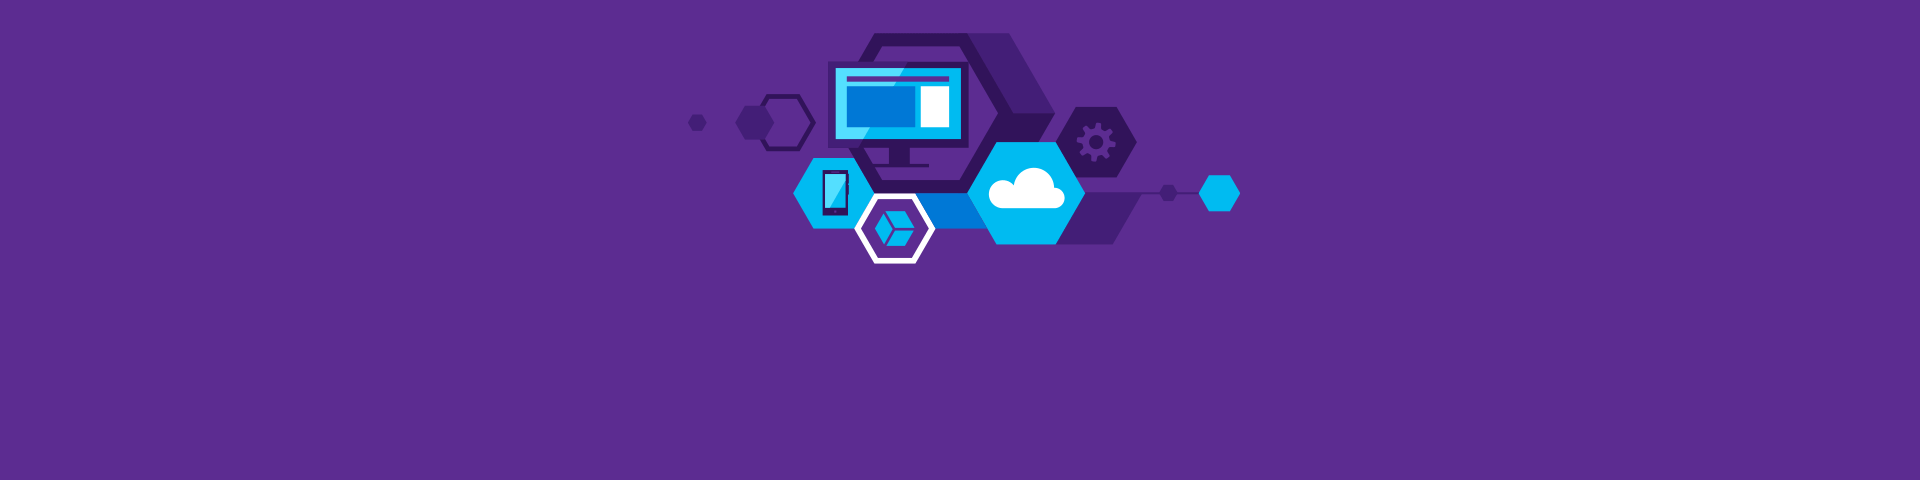 Pc, telefon, cloud og andre teknologiikoner